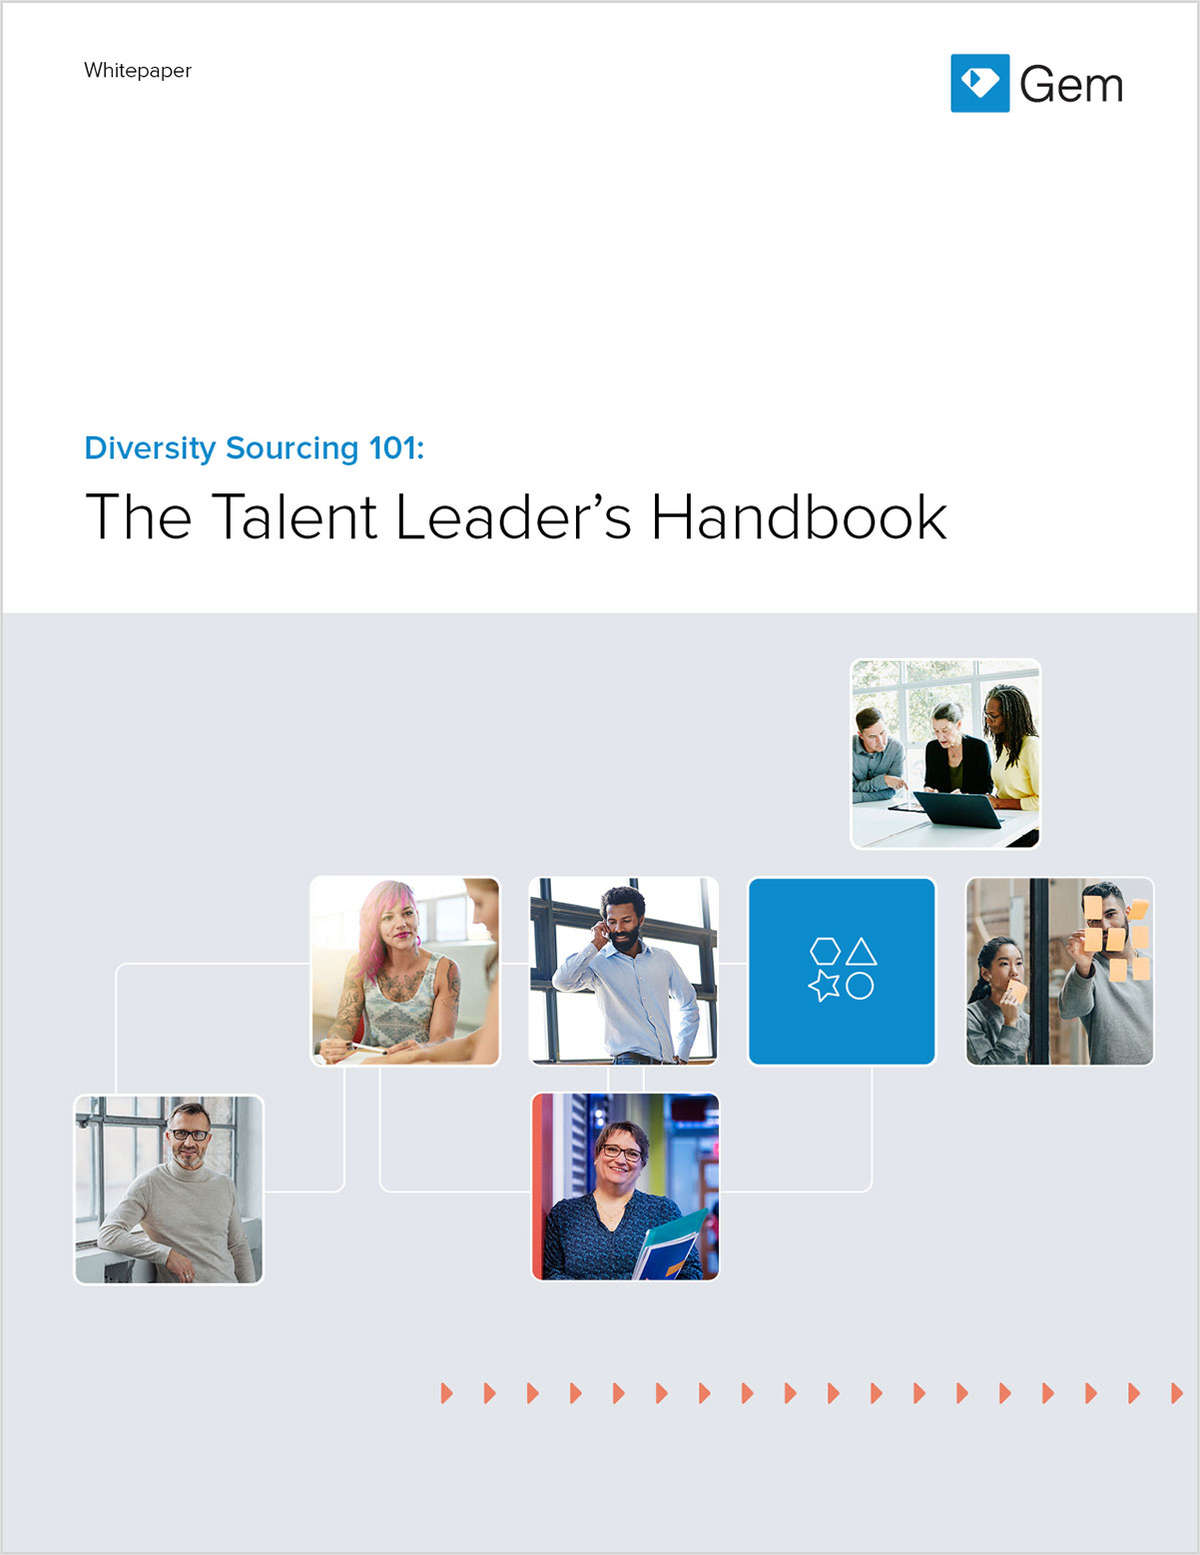 Diversity Sourcing 101: The Talent Leader's Handbook